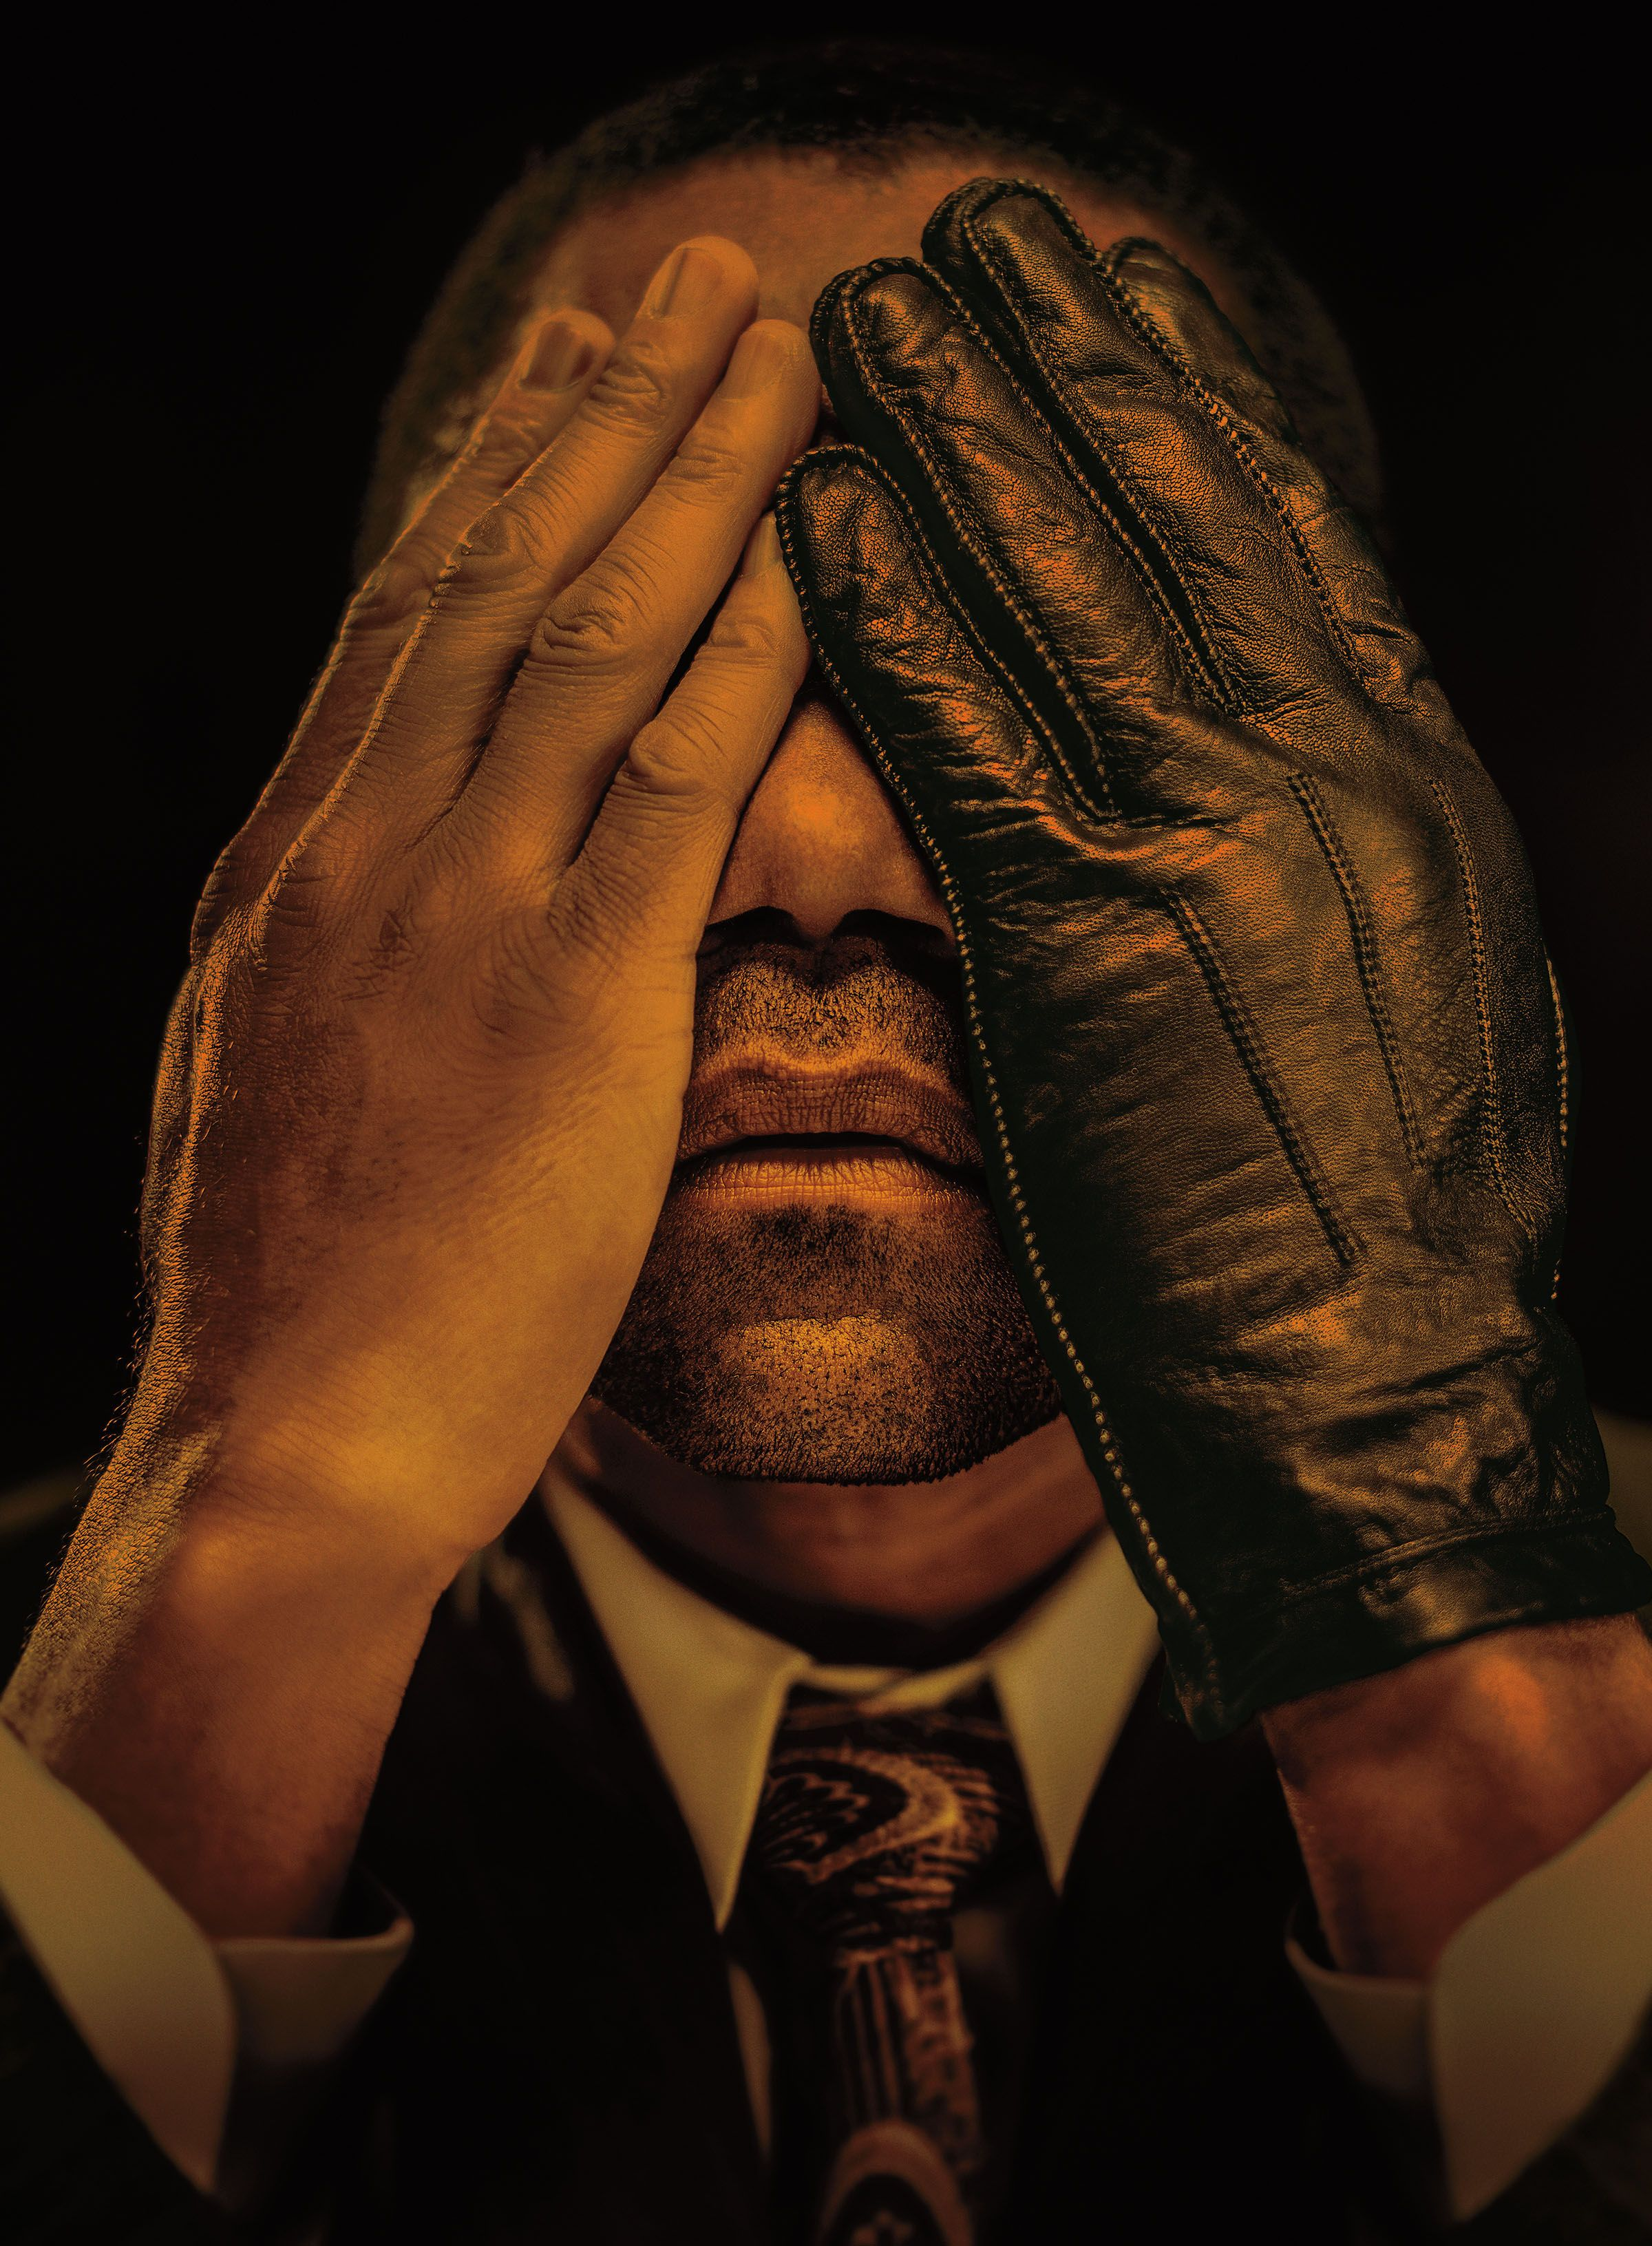 Ojos que no ven. Cuba Gooding Jr. interpreta a O.J. Simpson en la serie.